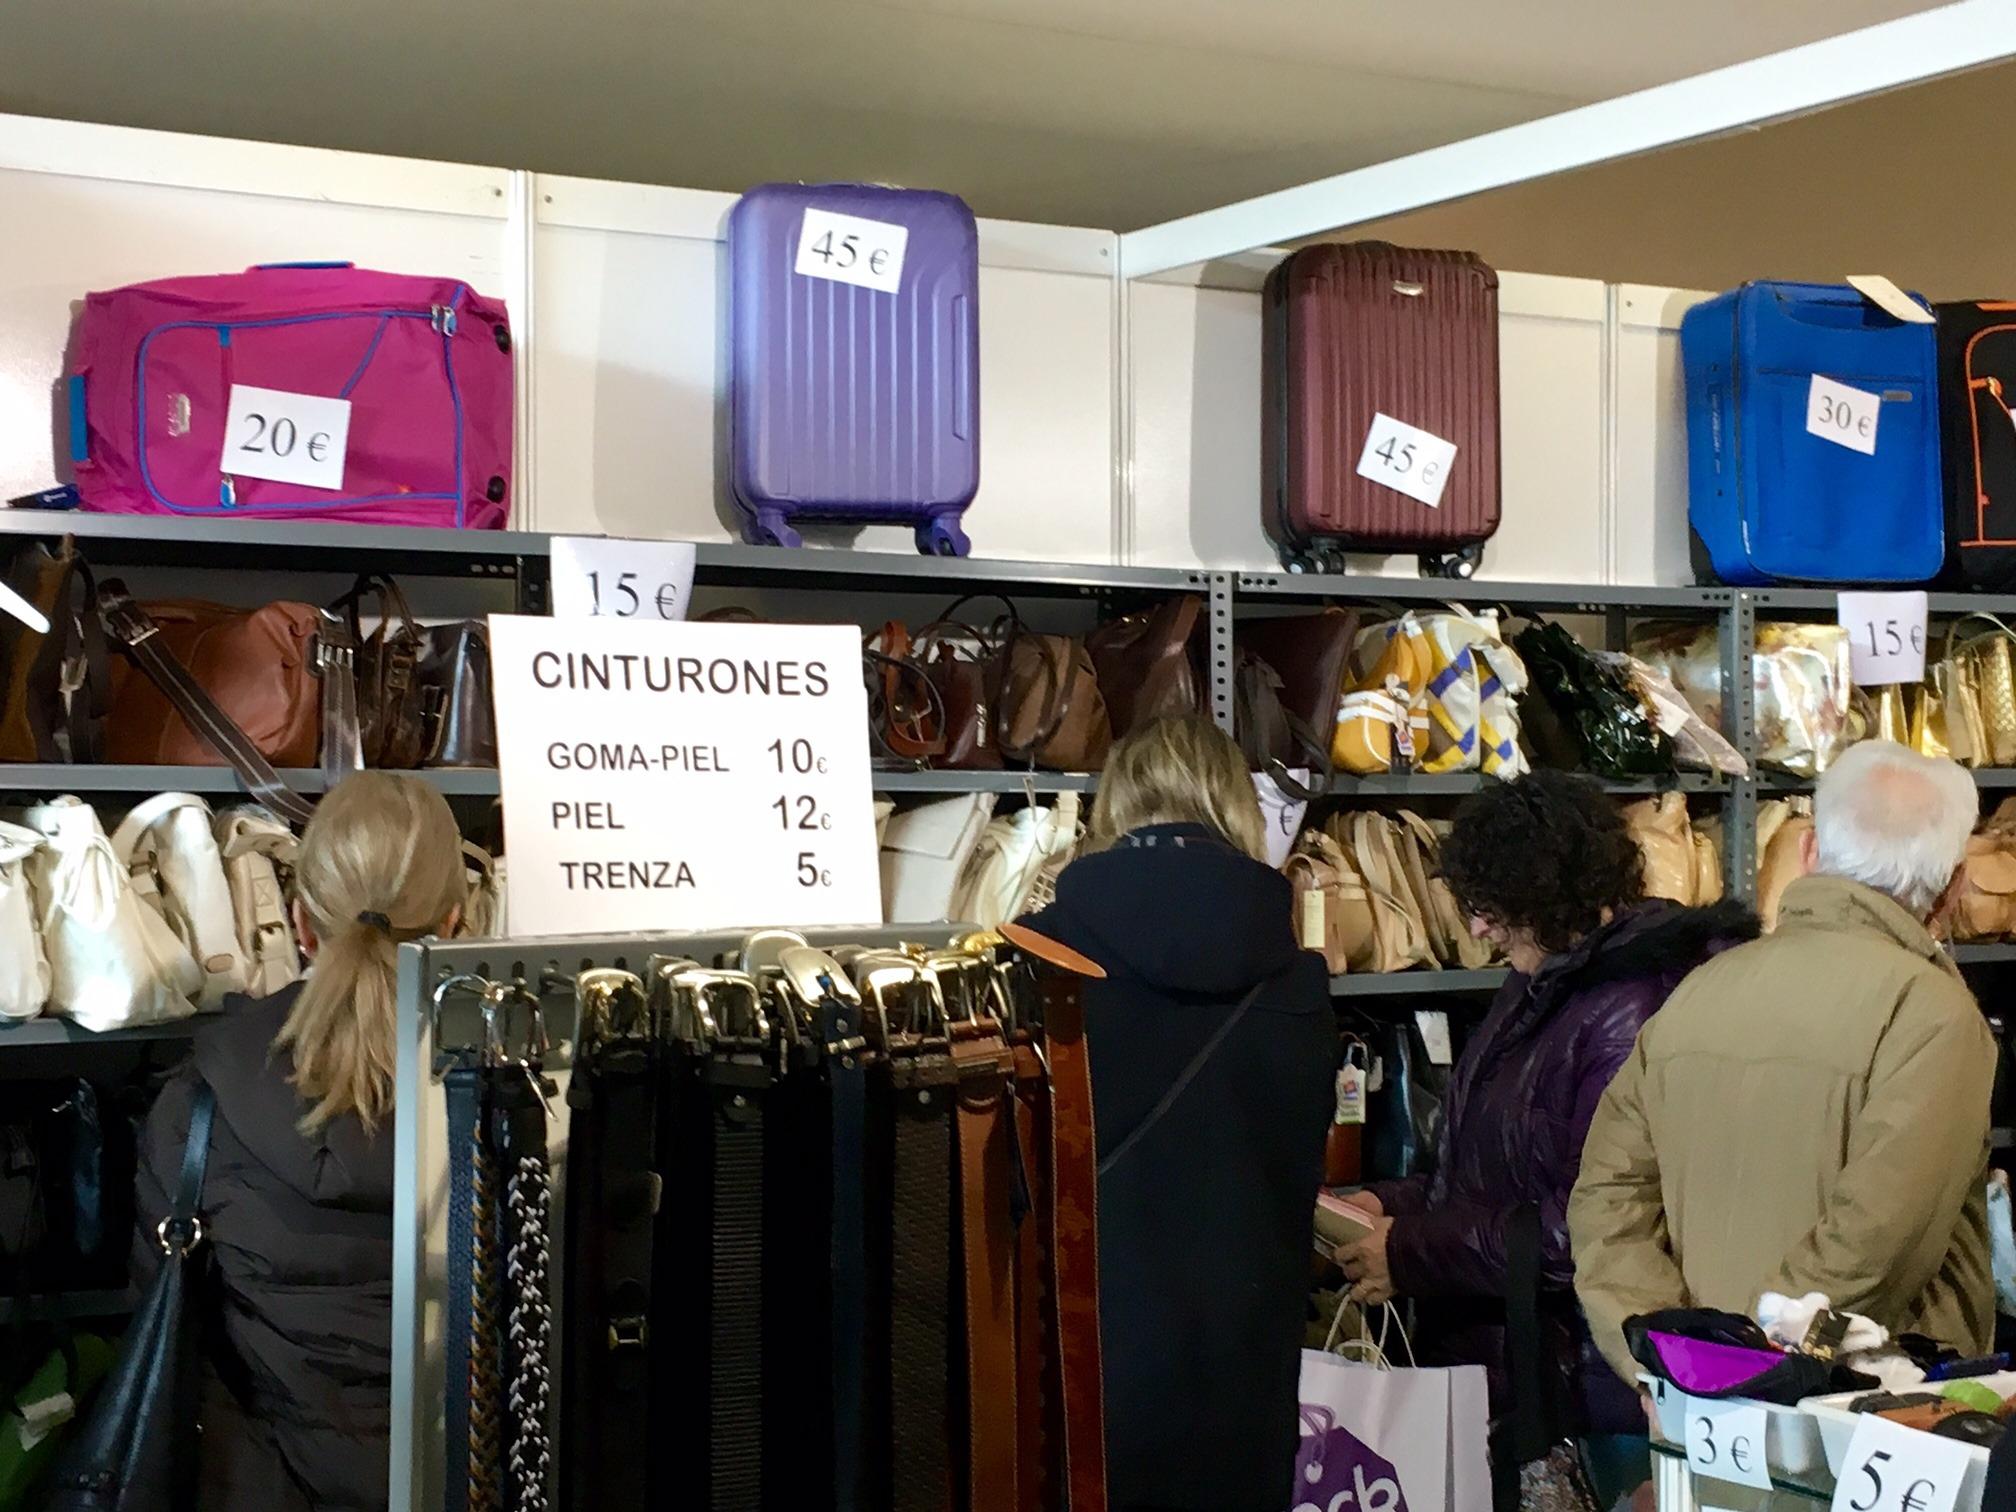 Desfiles de moda en pamplona stock 2017 navarra capital - Empresas limpieza pamplona ...